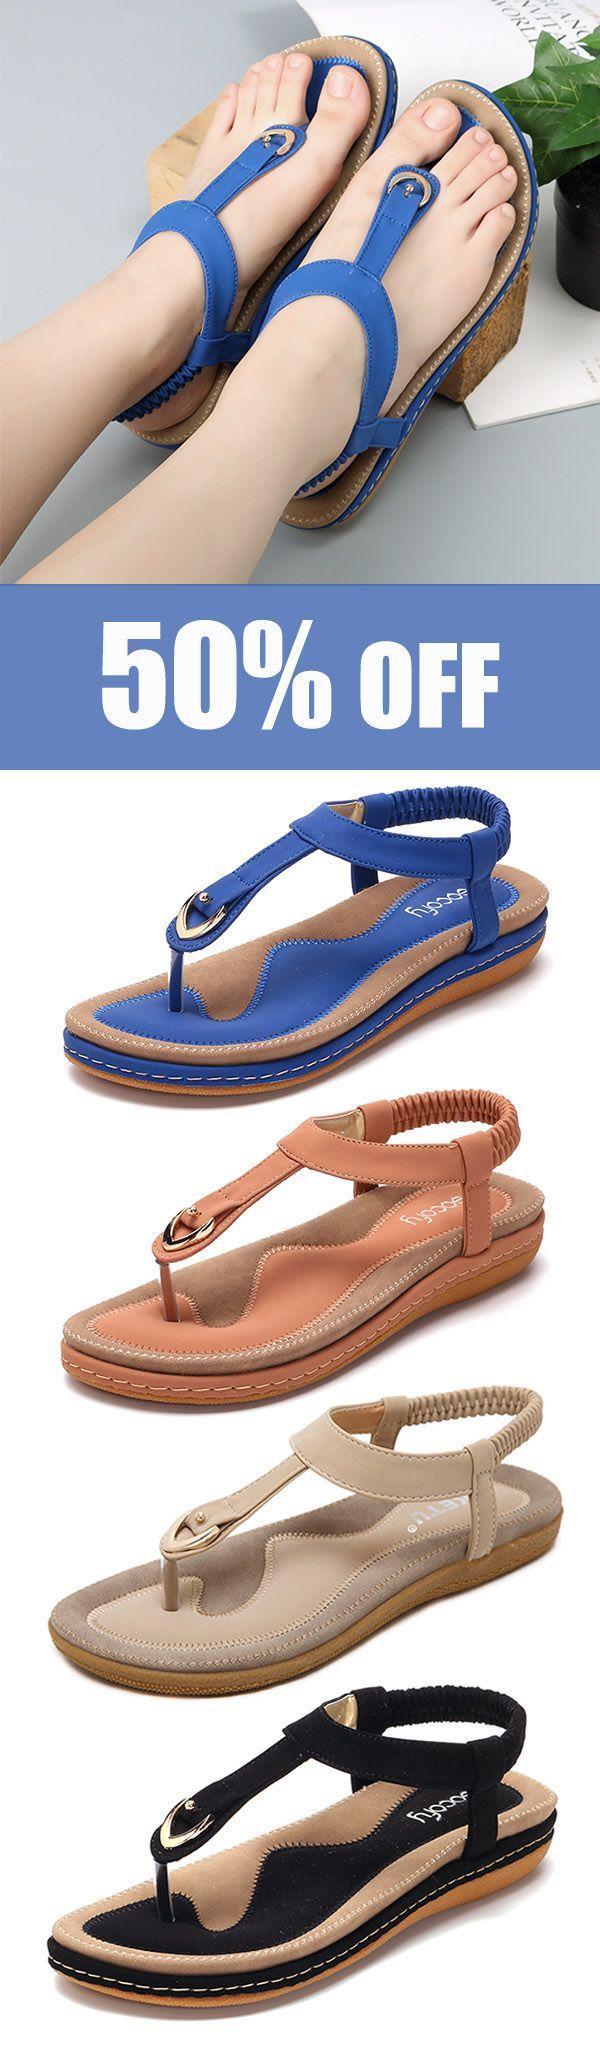 SOCOFY Comfortable Shoes Elastic Clip Toe Flat Beach Sandals US Size 5-13. #summer #fashion